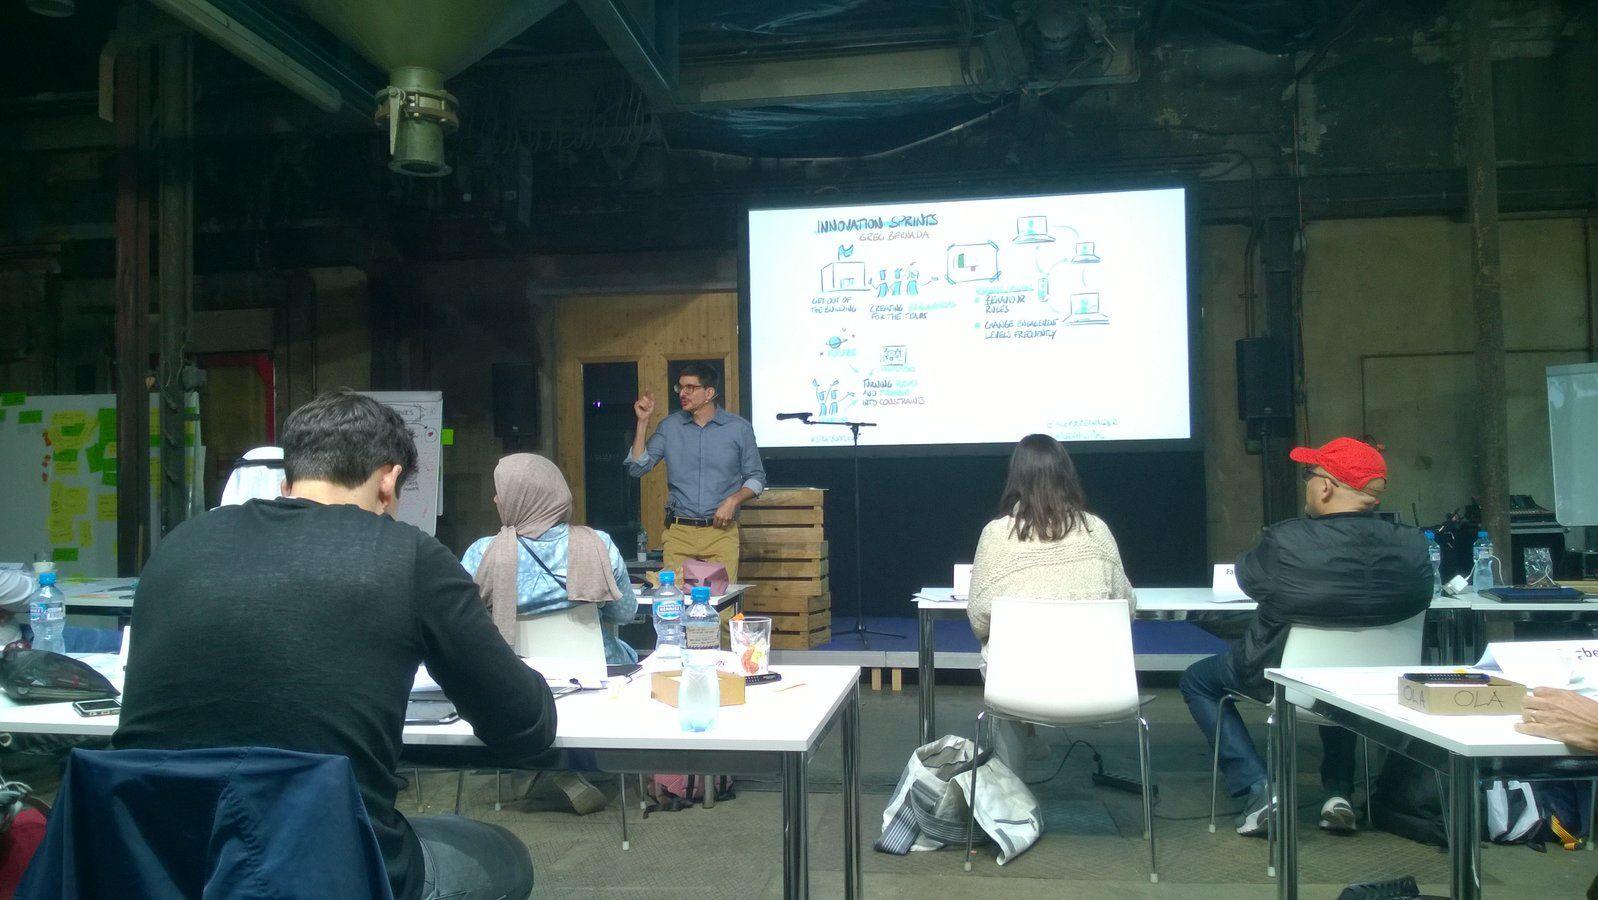 Alexander Osterwalder explains Strategyzer innovation sprint.